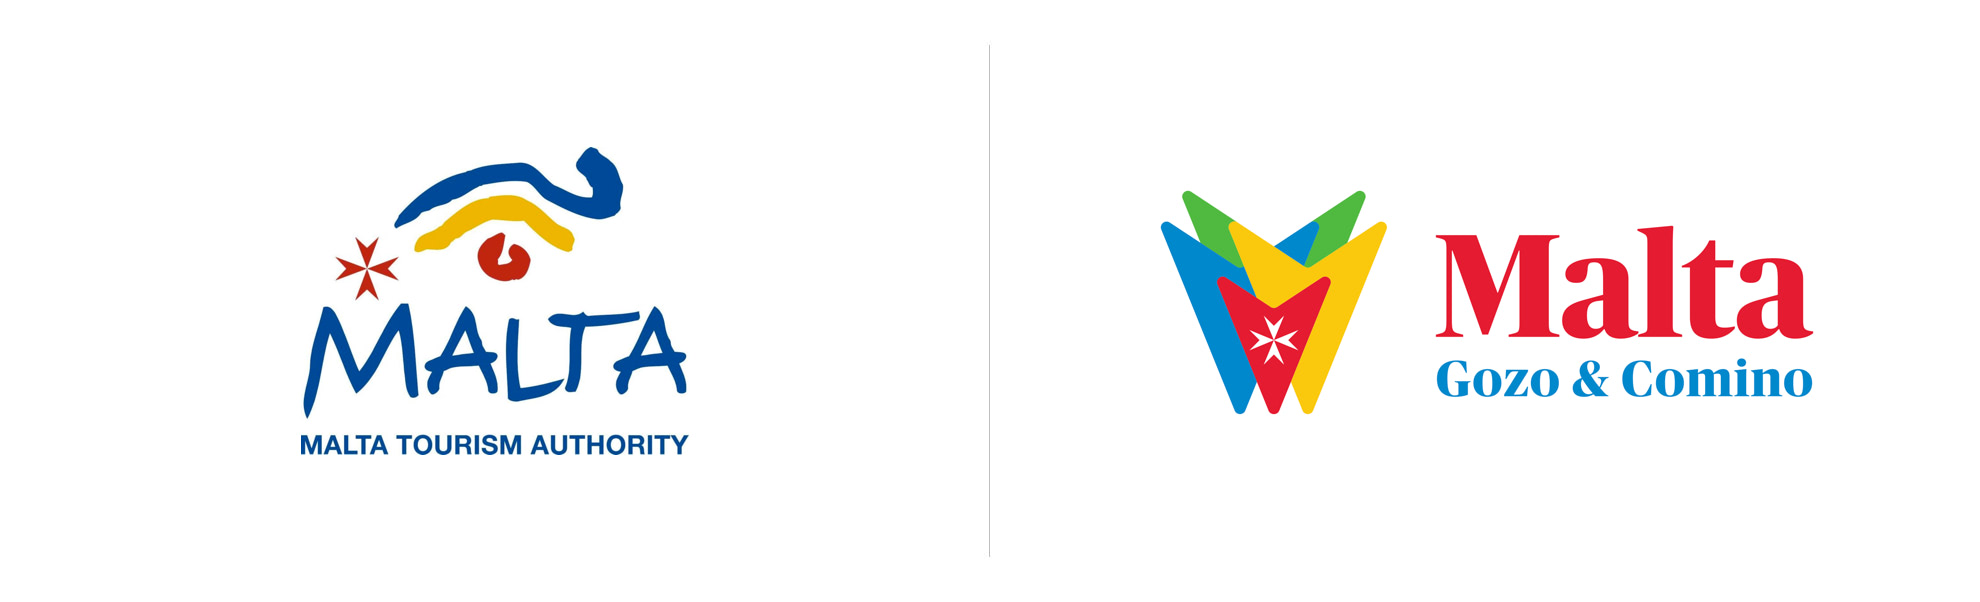 nowe istare logo malty